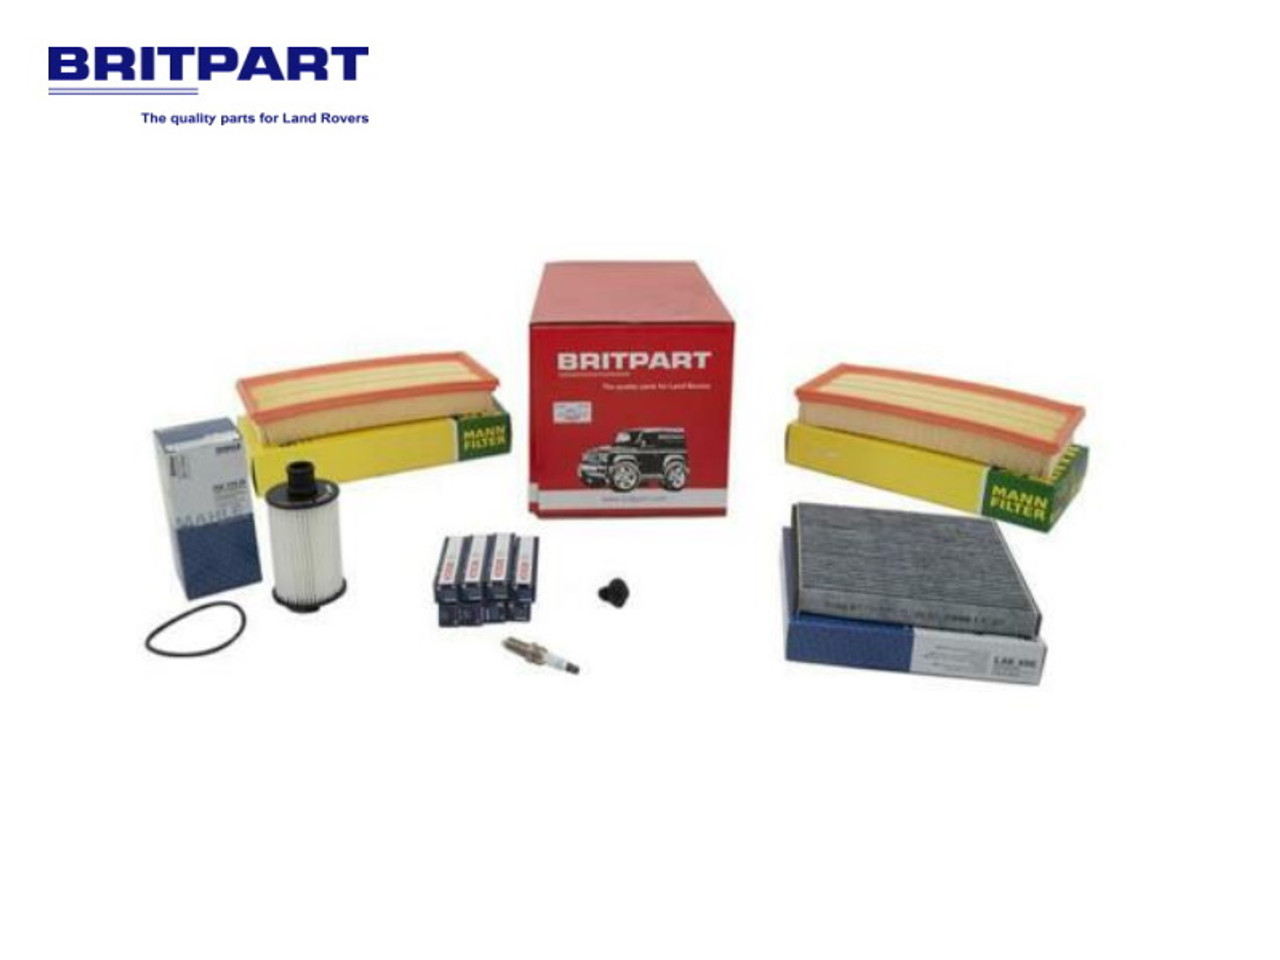 Britpart OEM Range Rover L405 And L494 5.0 V8 Service Kit - DA6099P